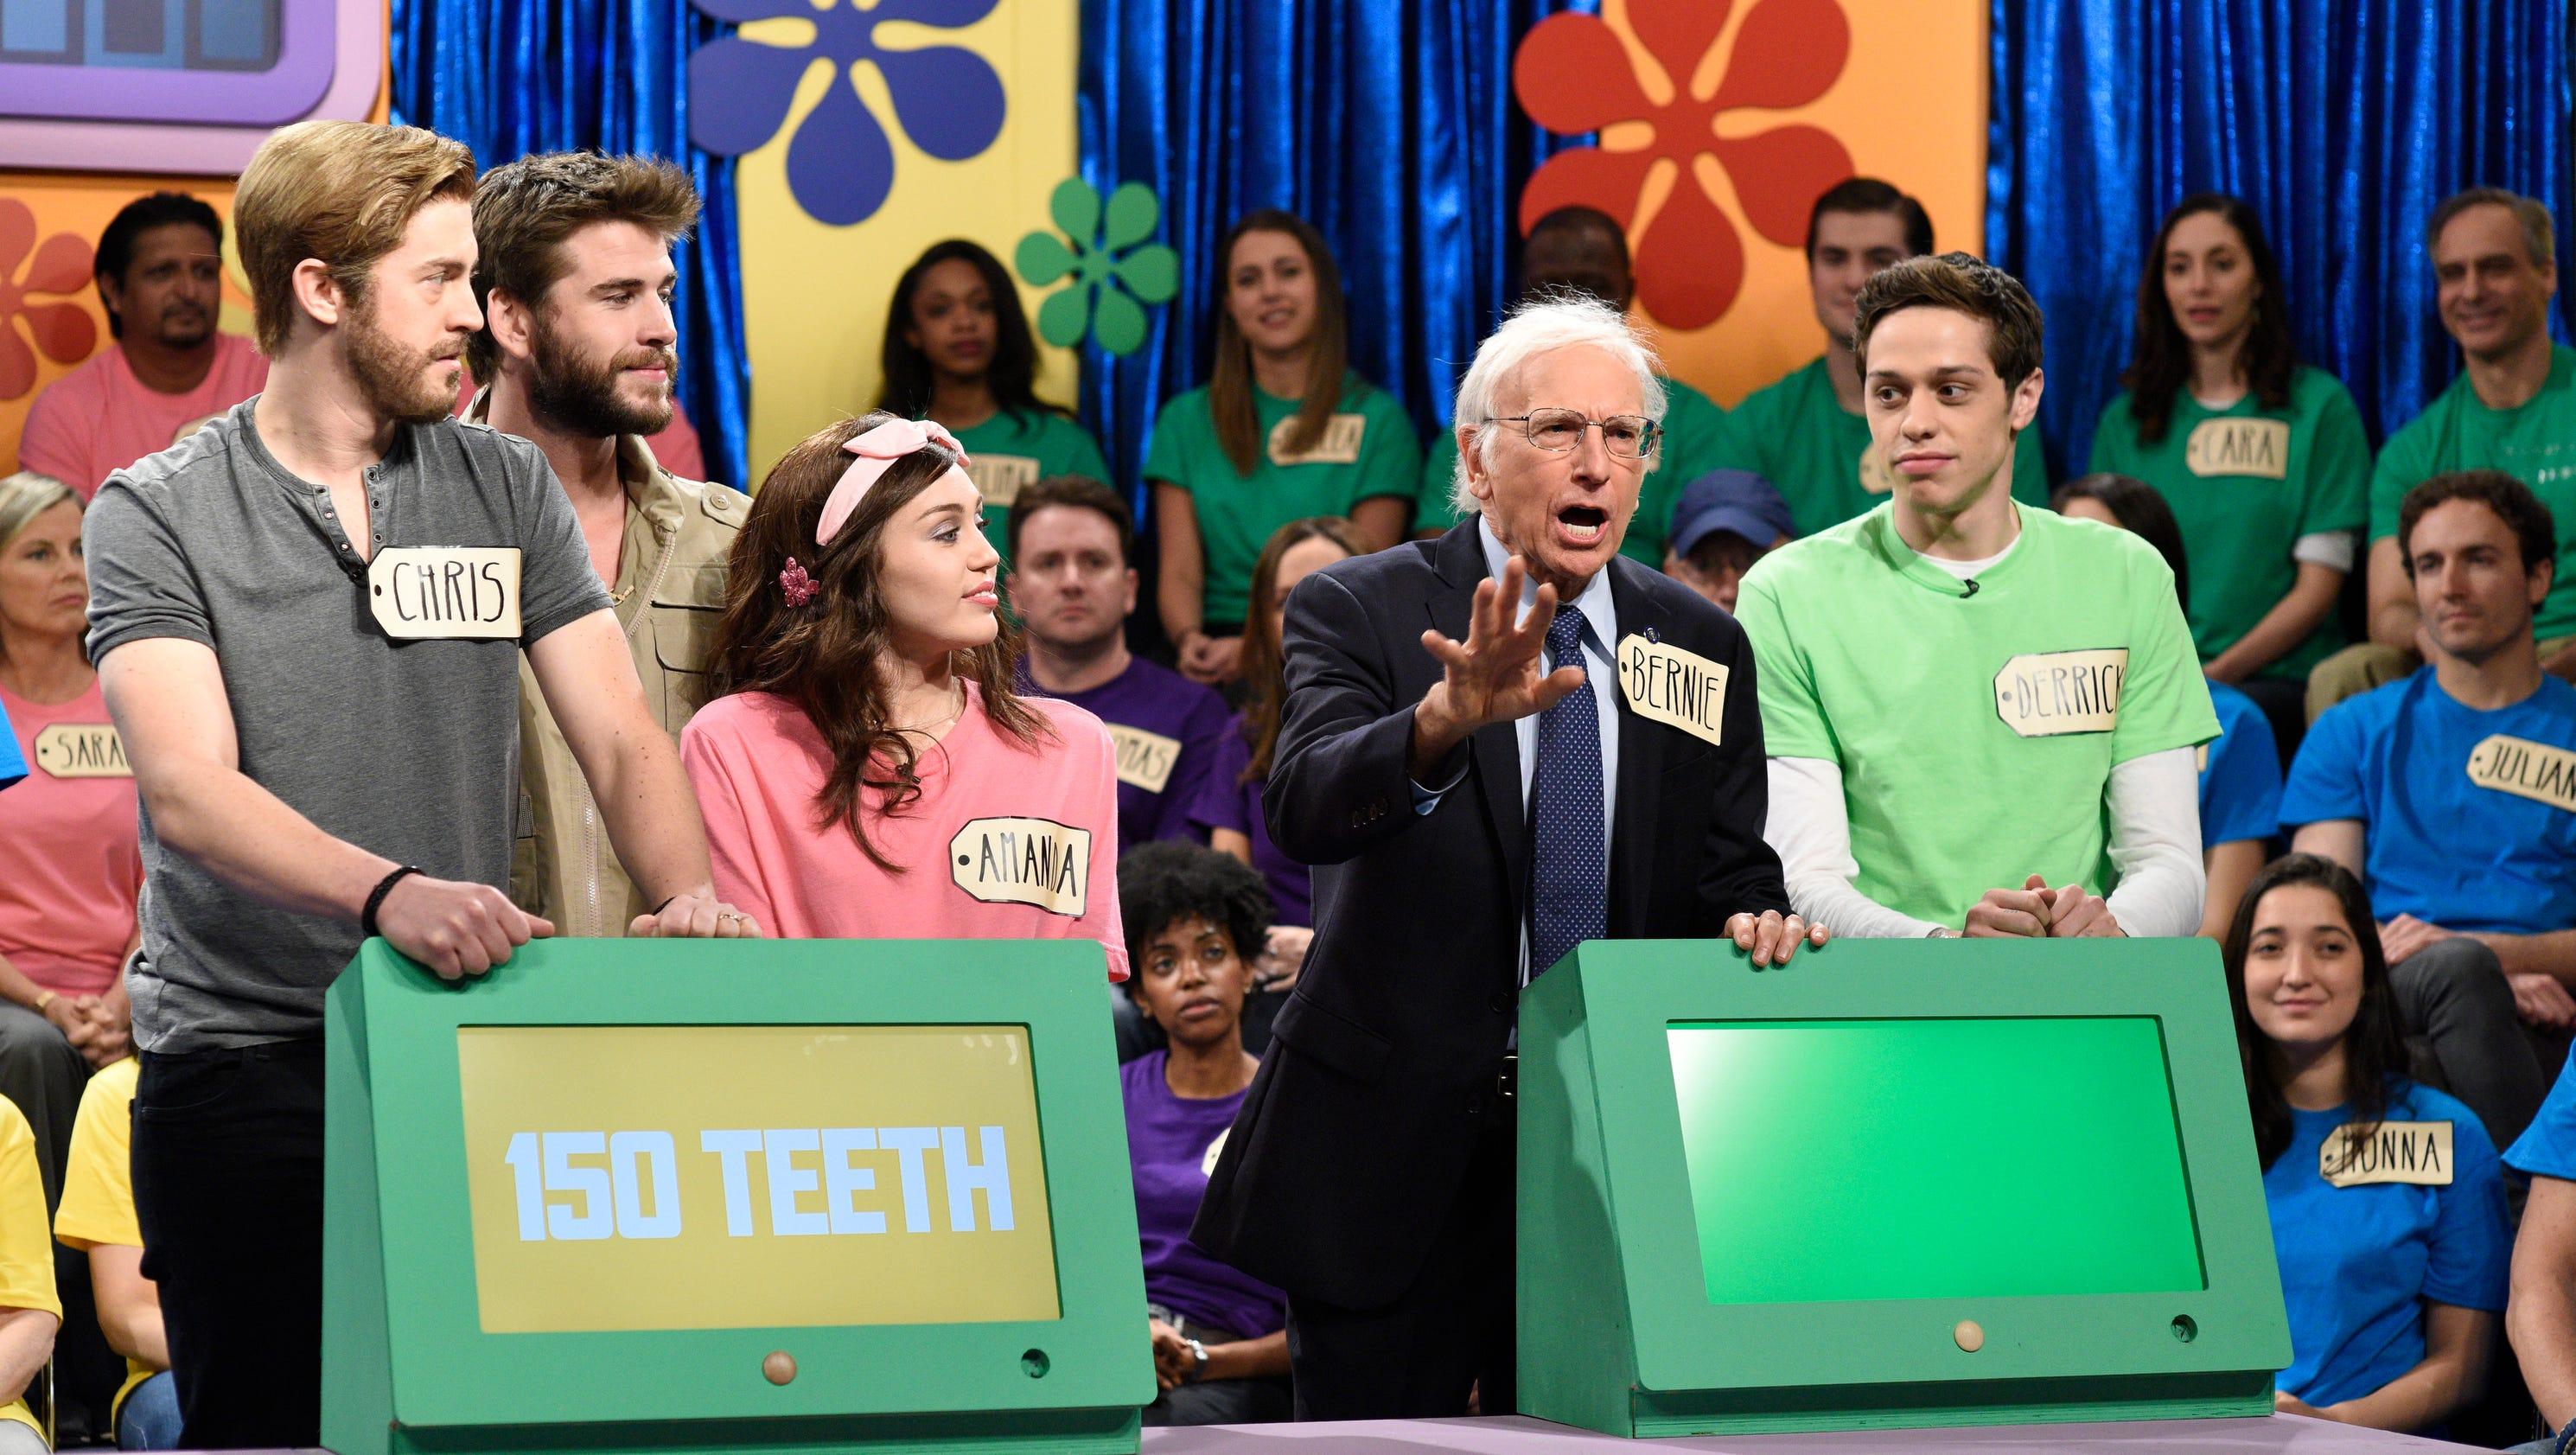 Larry David's Bernie Sanders returns to 'Saturday Night Live'